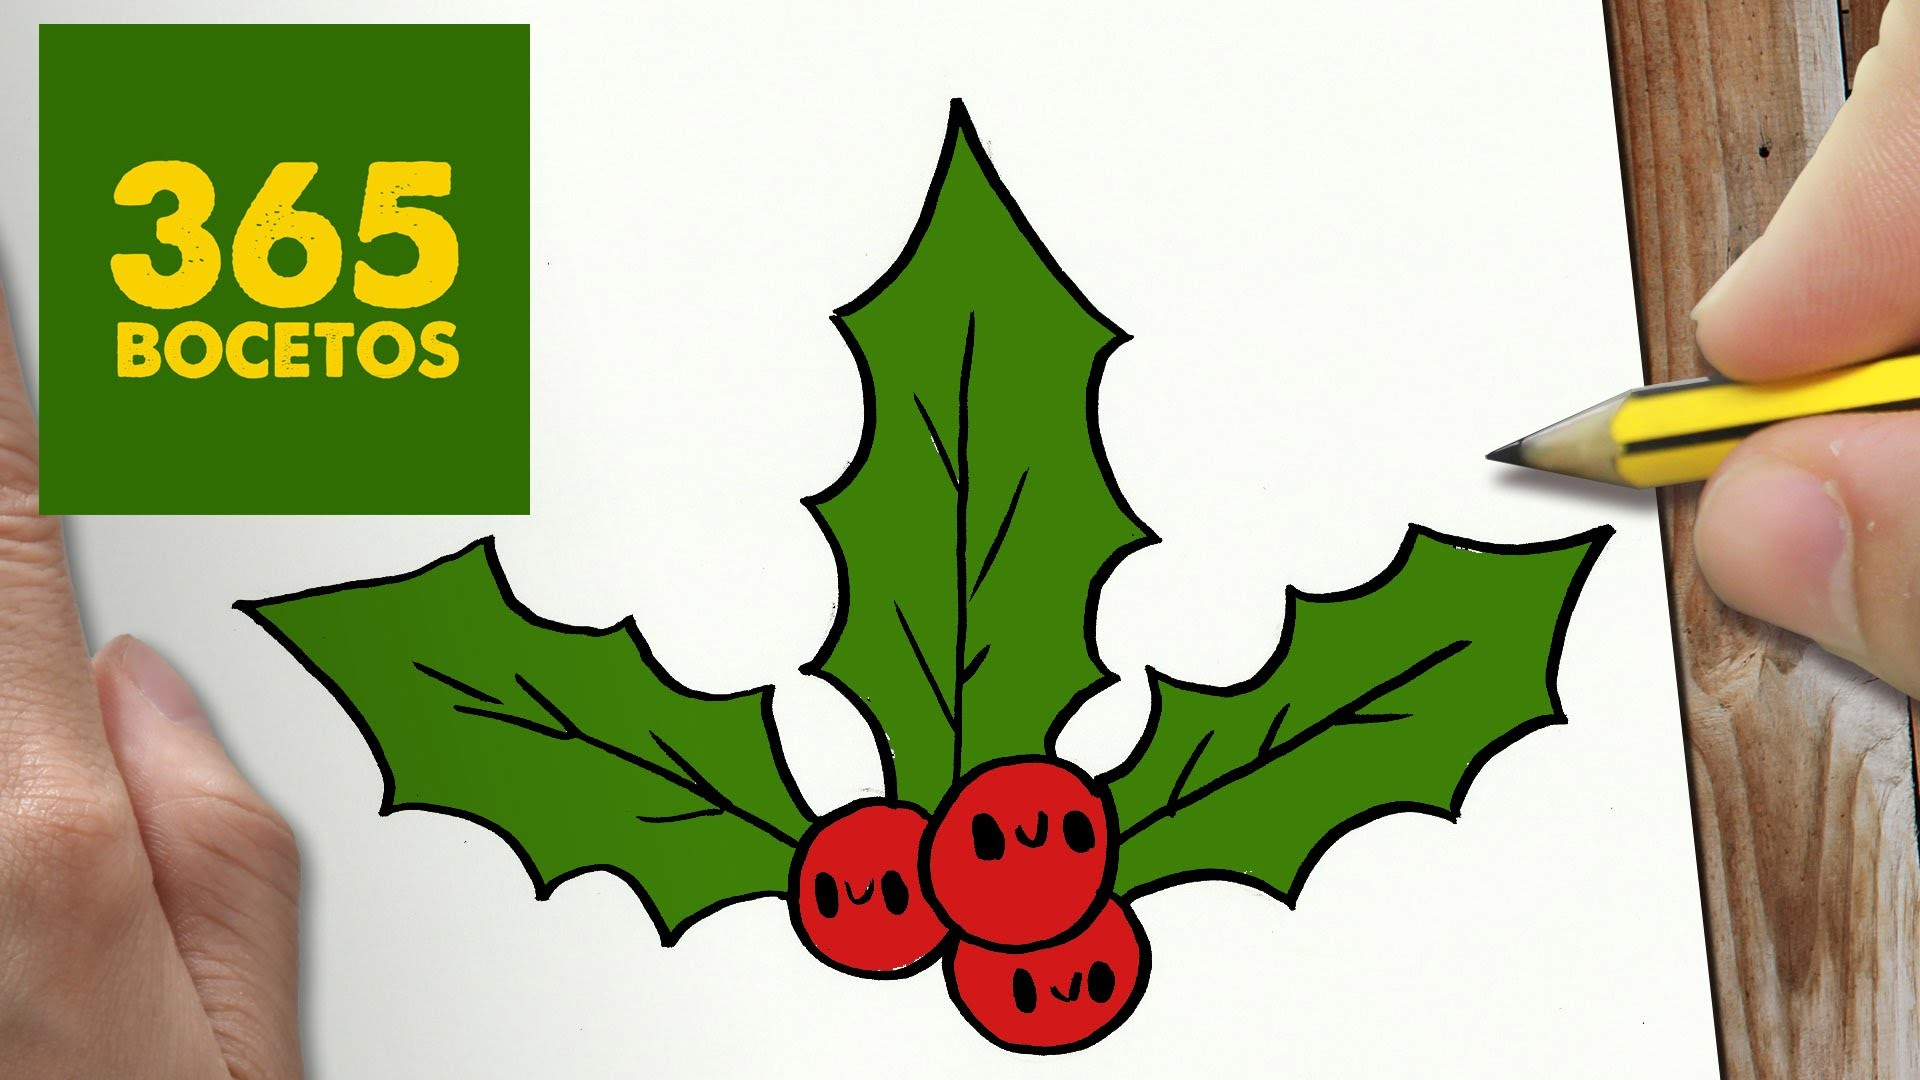 Como Dibujar Un Cuaderno Para Navidad Paso A Paso Dibujos: COMO DIBUJAR UN ADORNO PARA NAVIDAD PASO A PASO: Dibujos